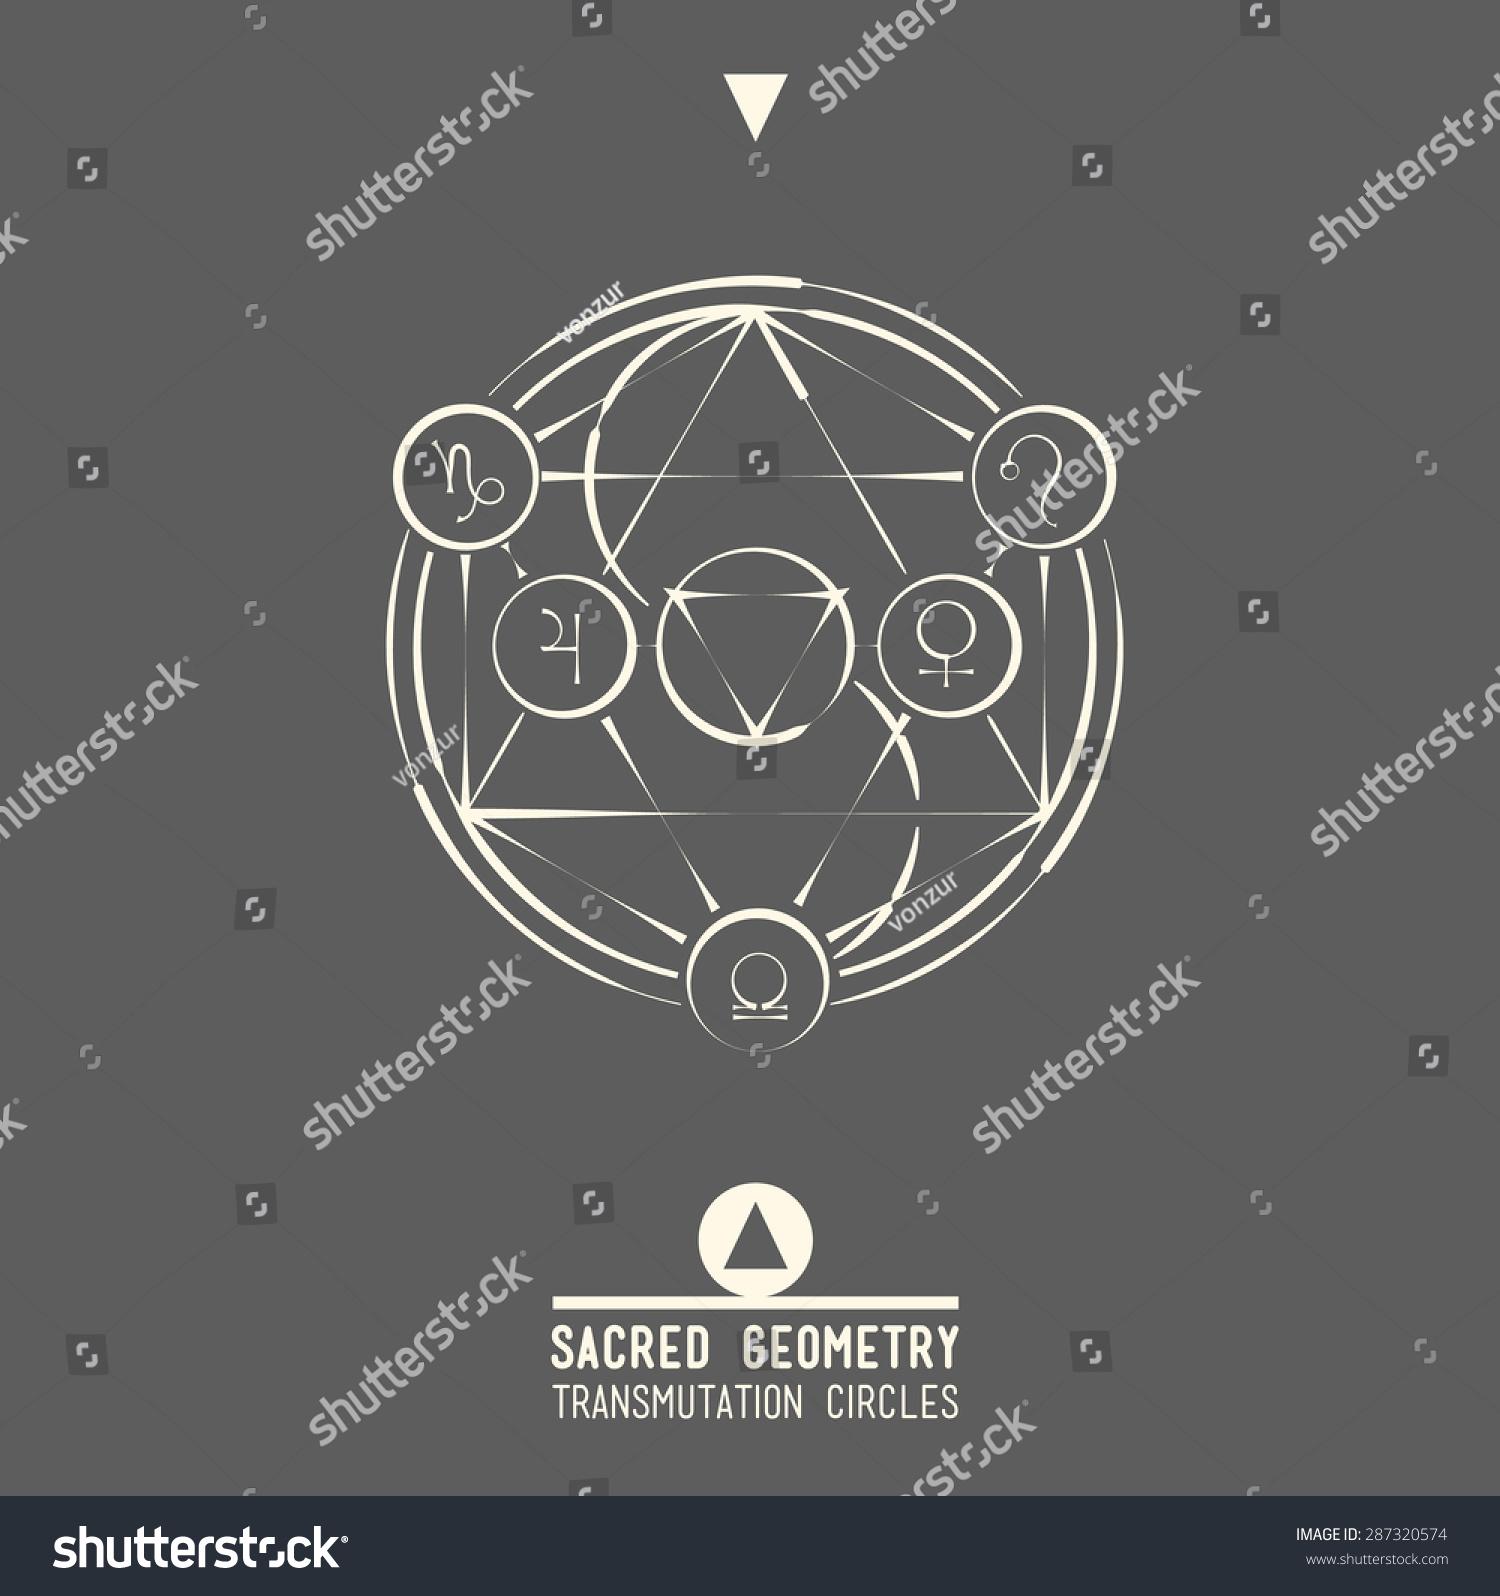 Poster transmutation circlessacred geometry set trendy stock sacred geometry set of trendy vector alchemy symbols collection background religion biocorpaavc